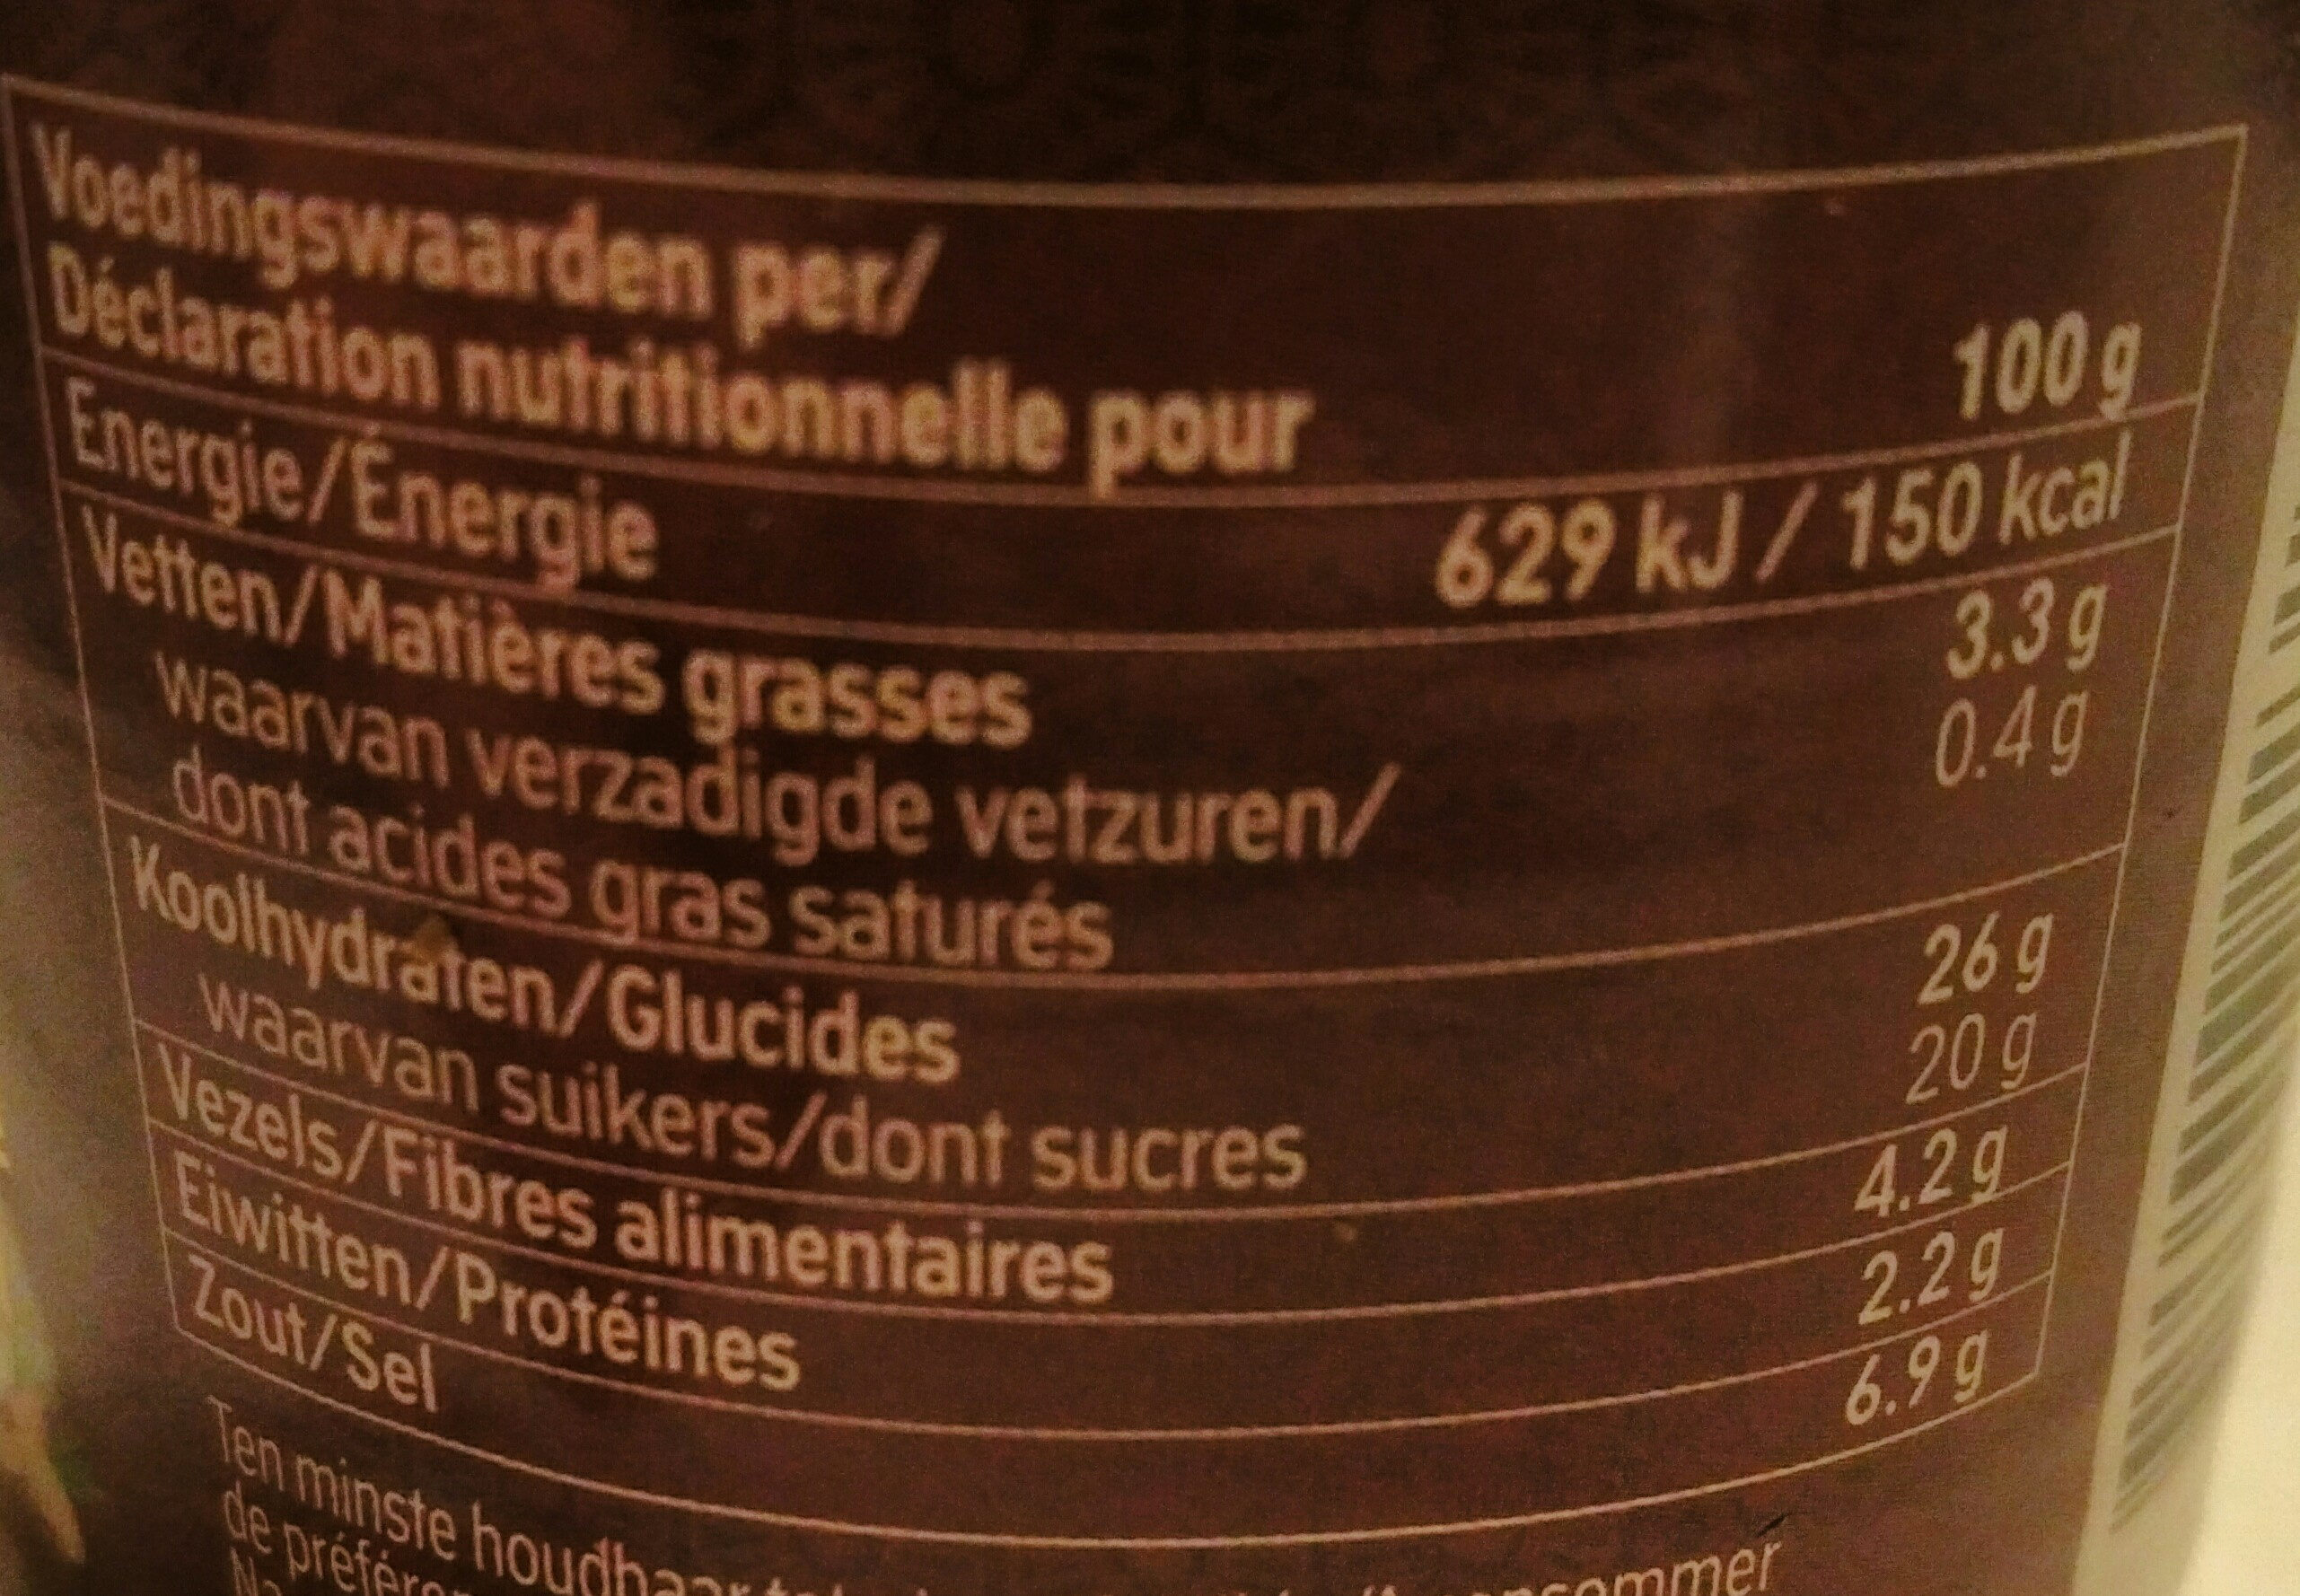 Sambal badjak extra hot - Voedingswaarden - nl